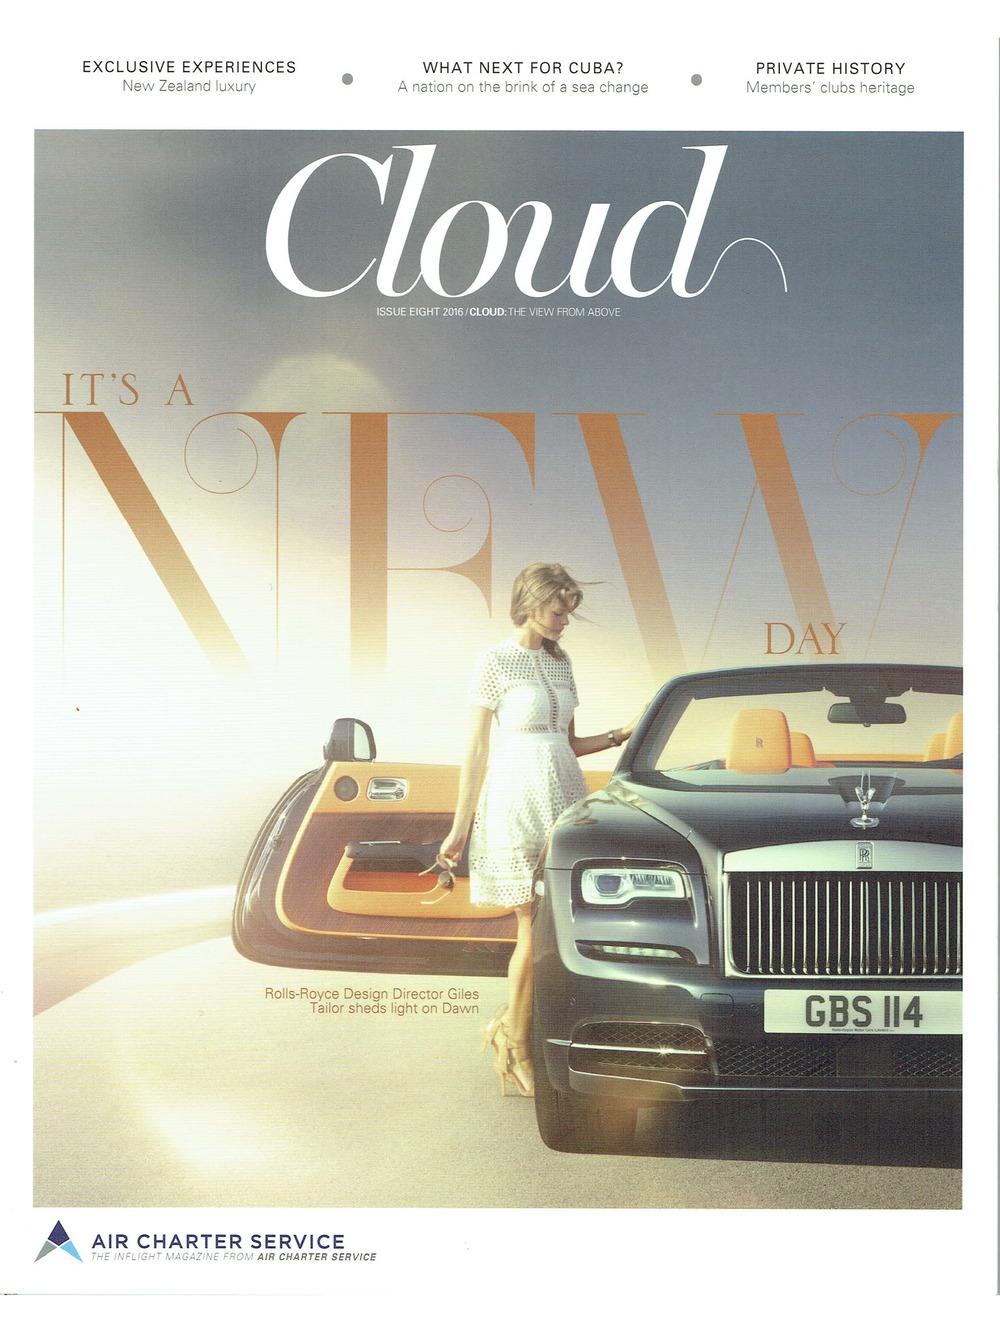 Cloud - New Zealand_Page_1.jpg